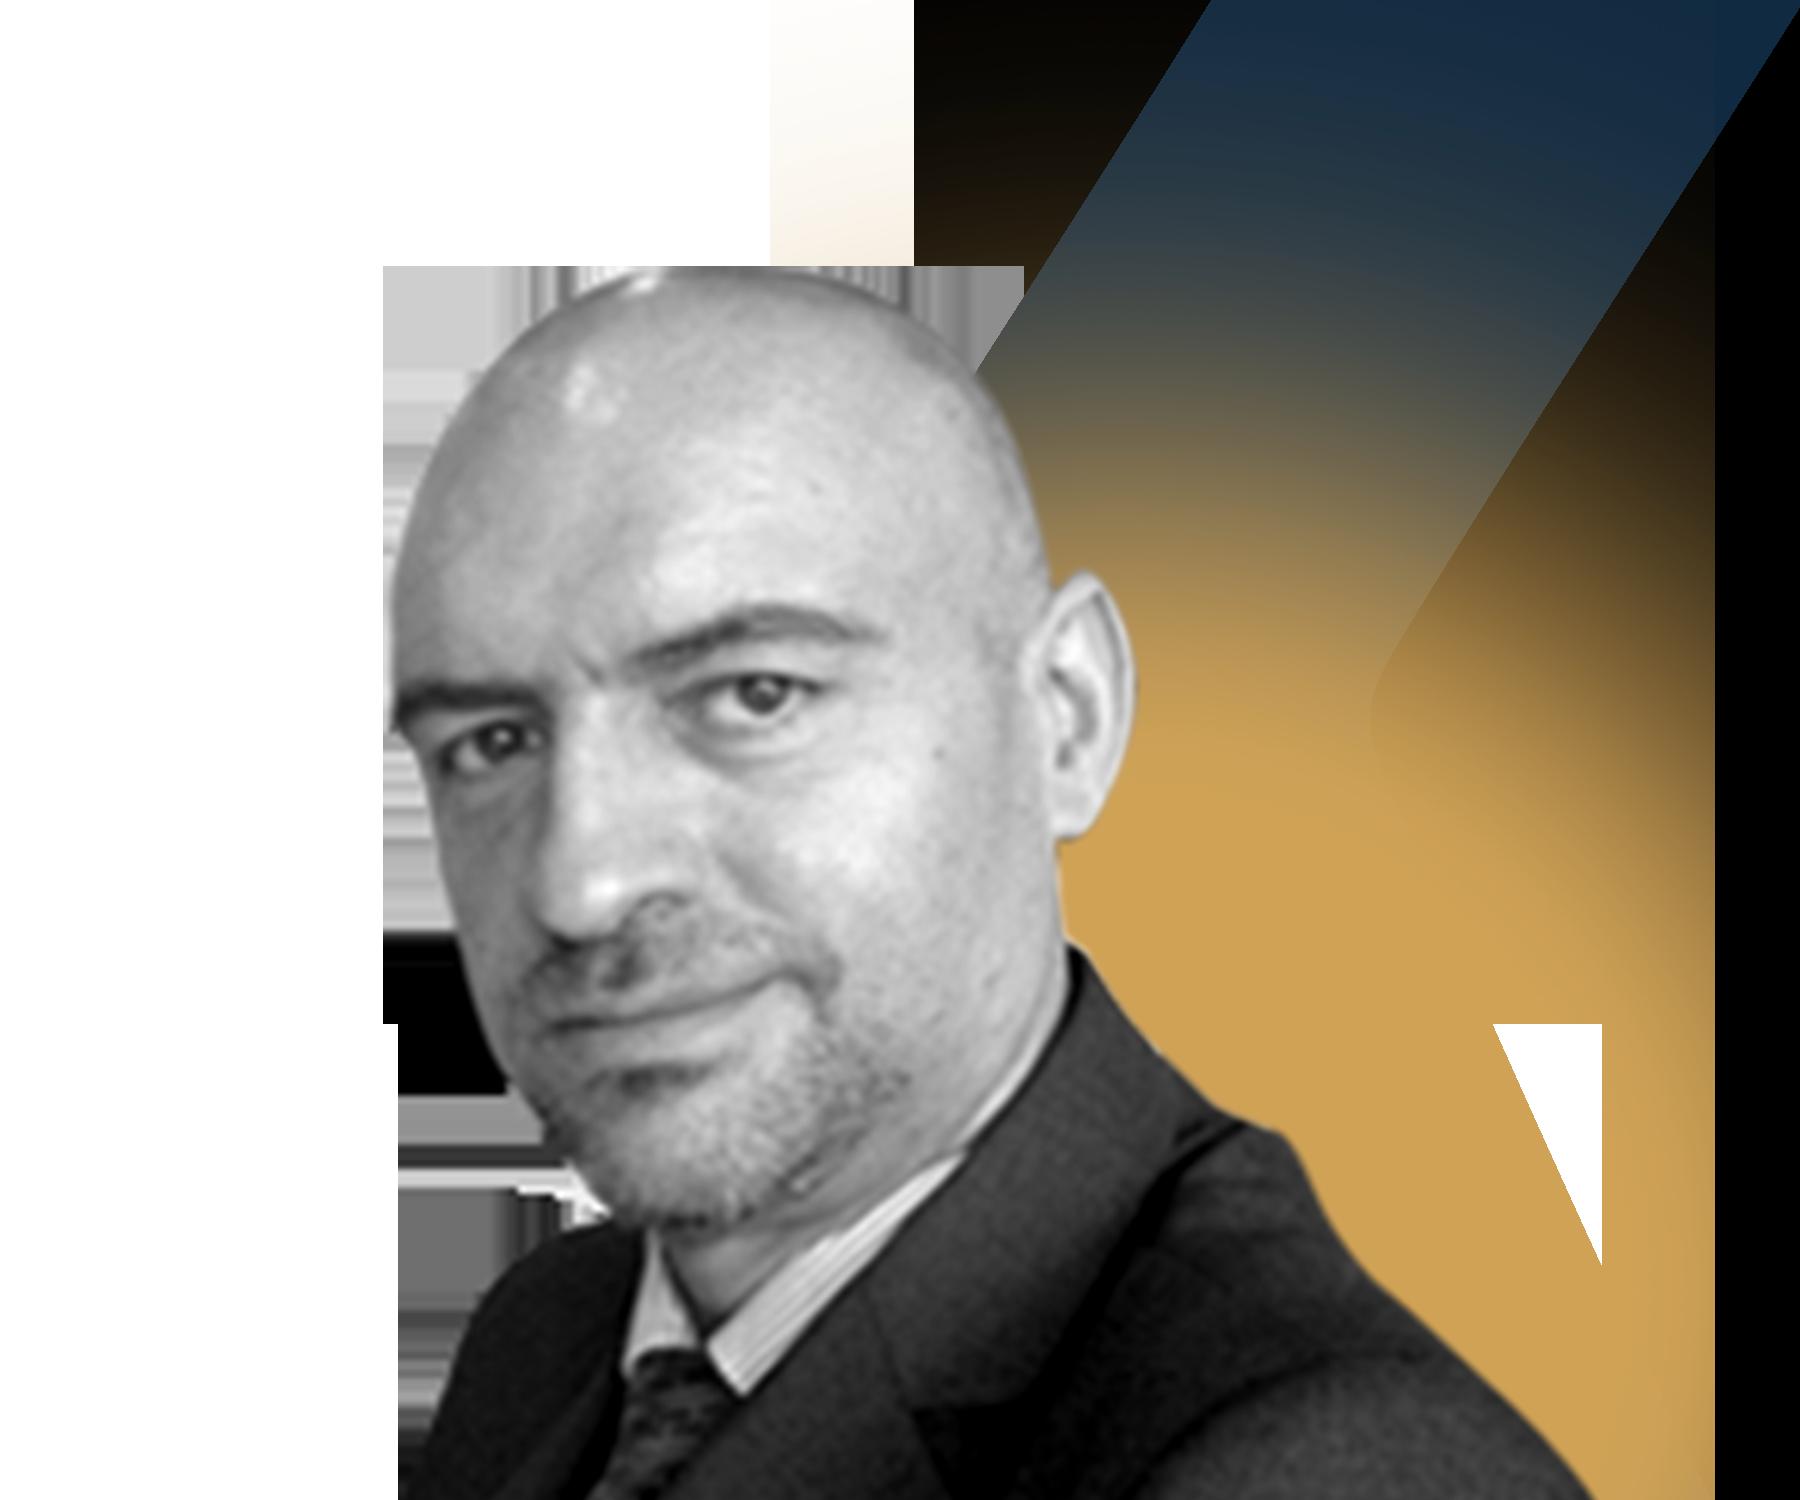 FLAVIO CATENI, Advisor on corporate DB Pensions and Financial & Control (former Pirelli UK CFO and Pirelli Spa Head of several Controlling & Reporting areas)